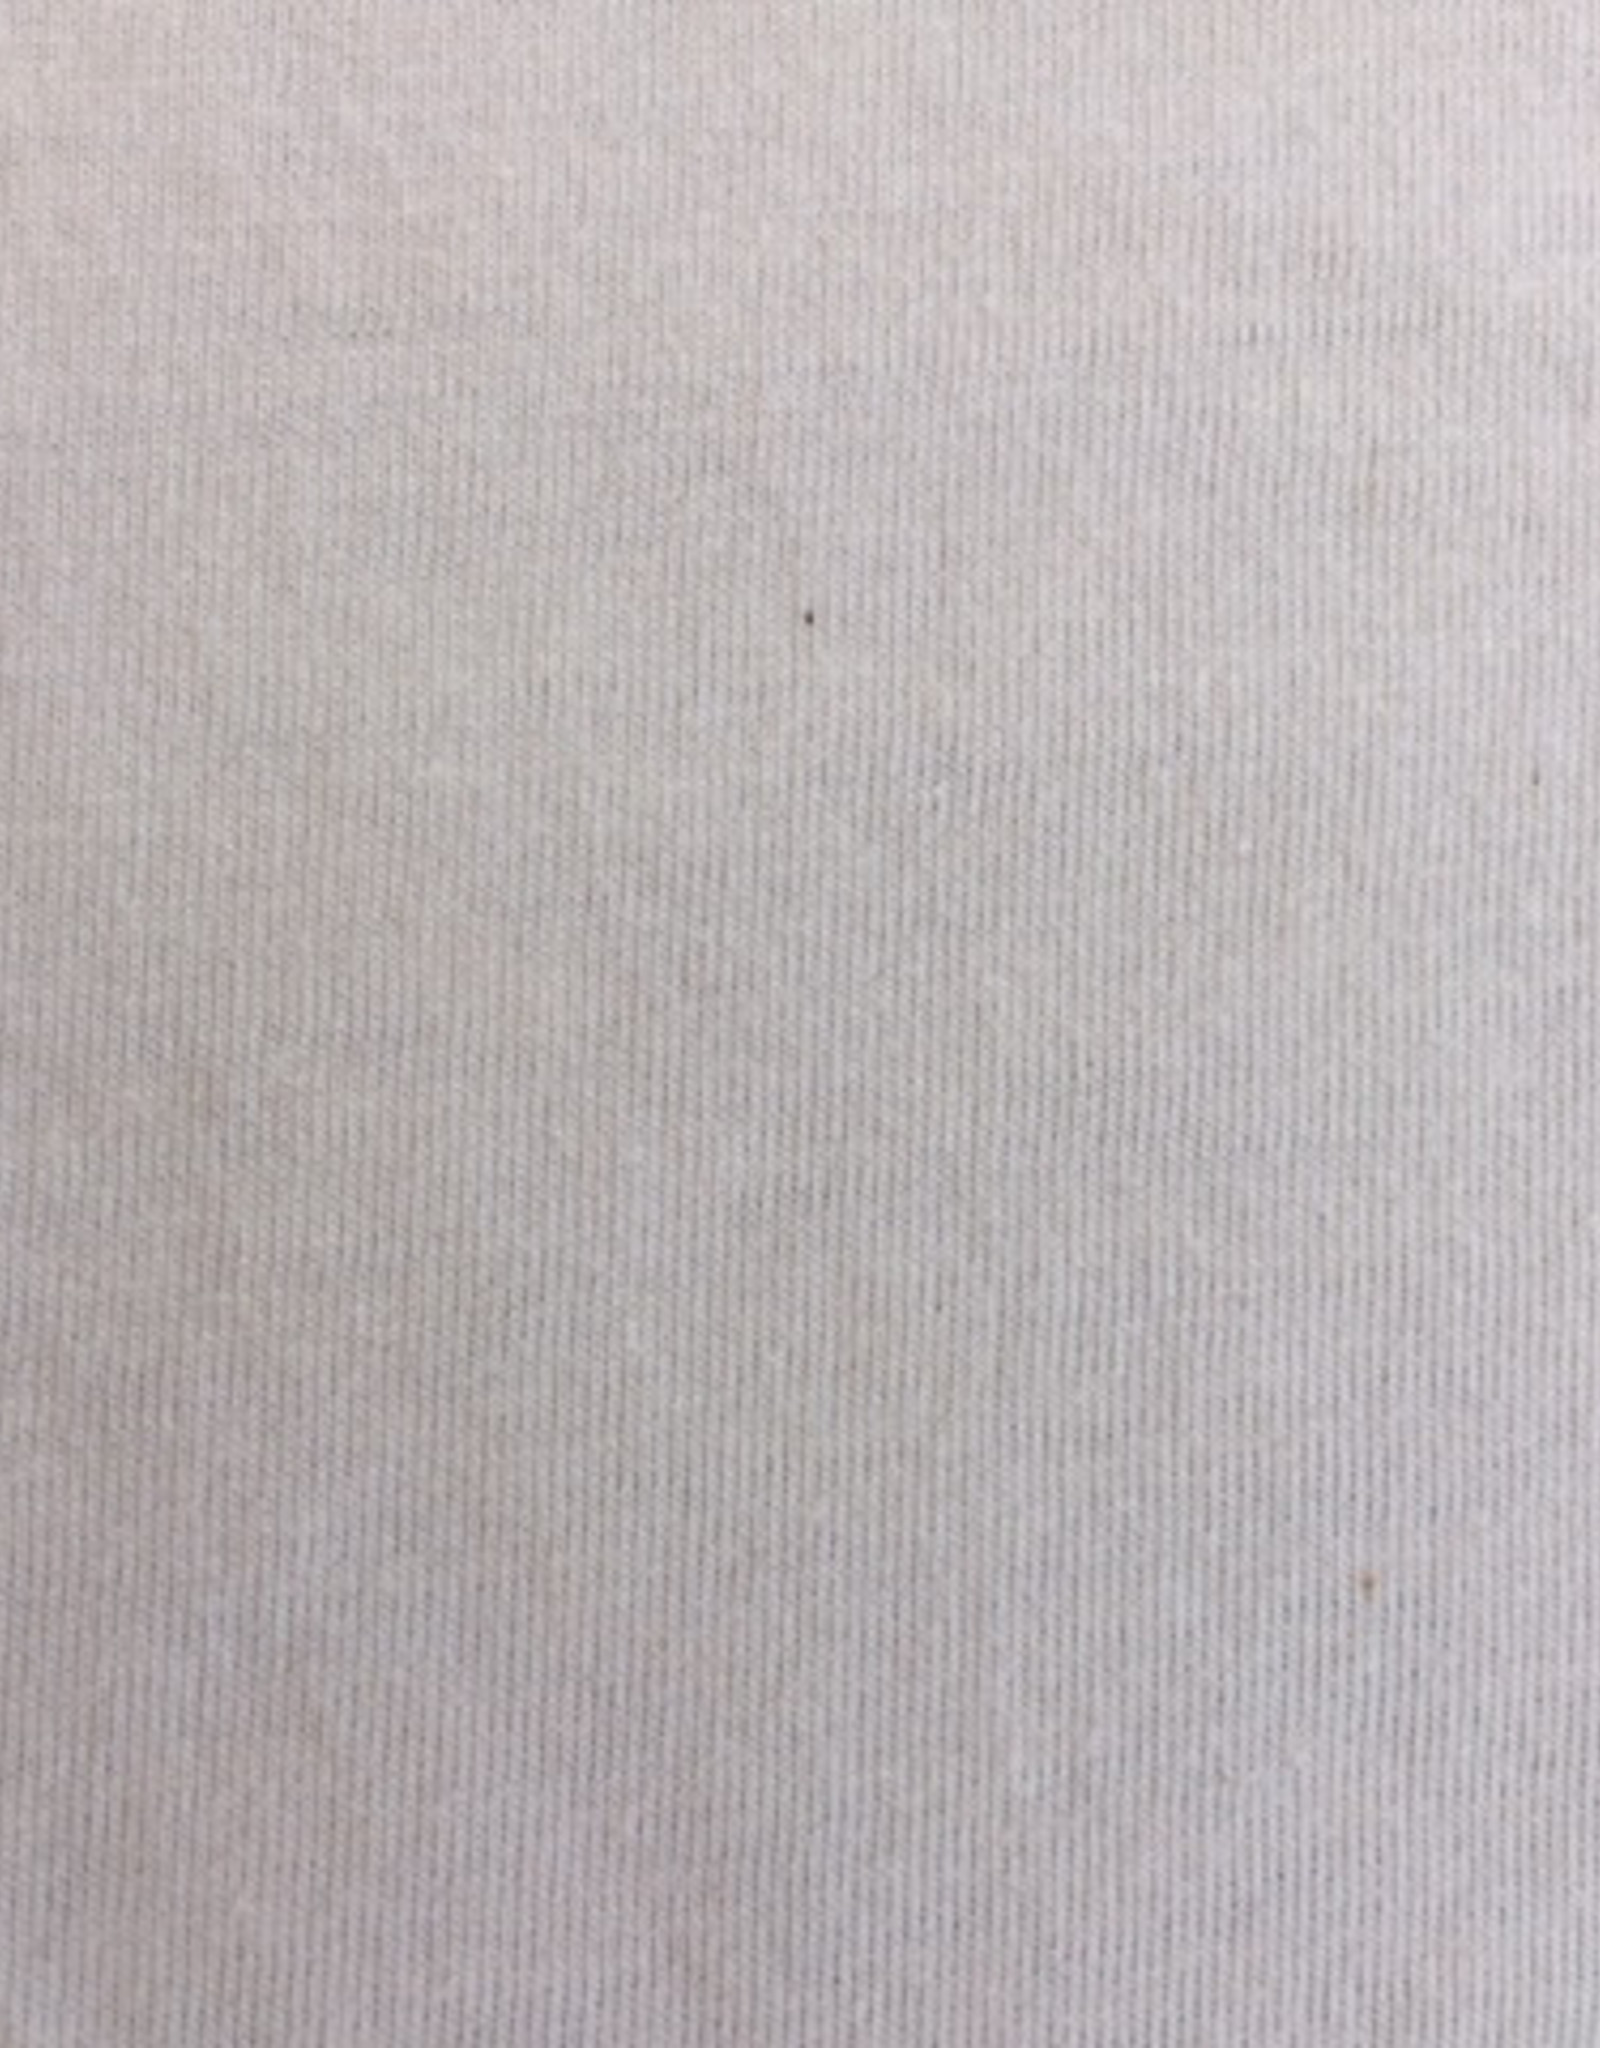 single jersey ecru 4% elastan OCCGuarantee  175grs.